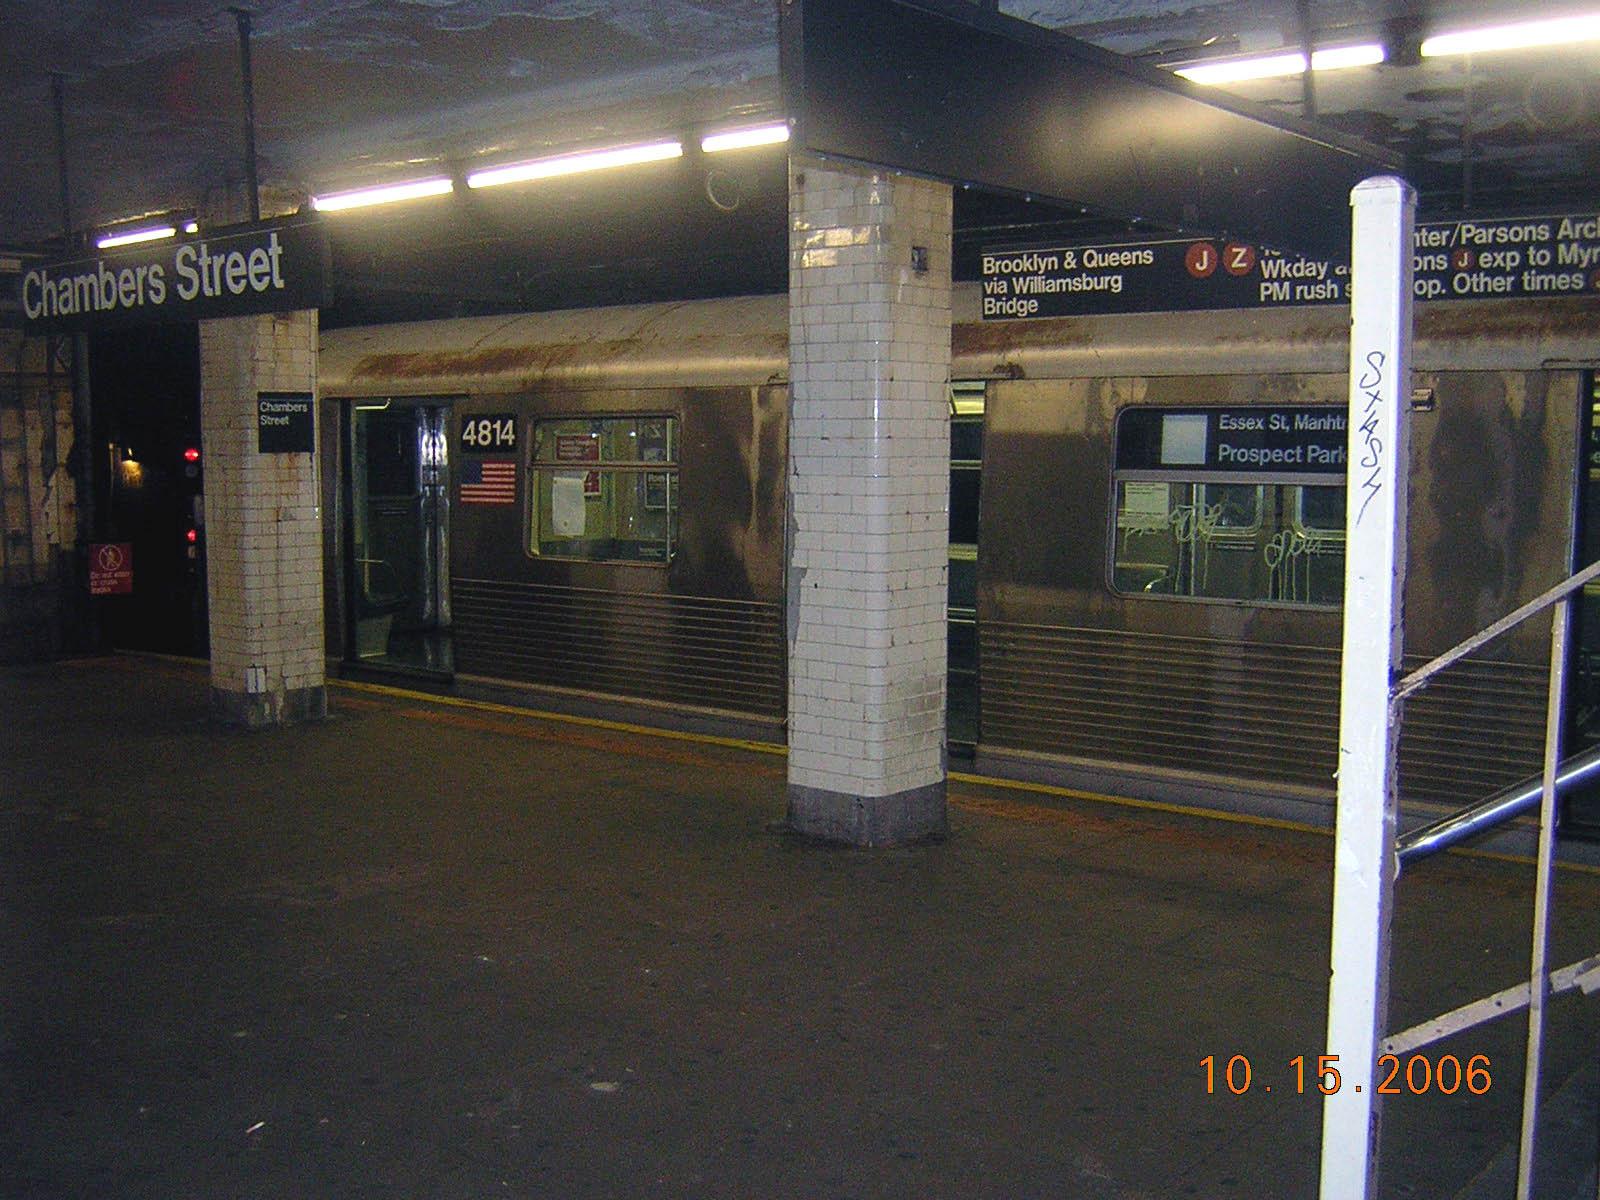 (290k, 1600x1200)<br><b>Country:</b> United States<br><b>City:</b> New York<br><b>System:</b> New York City Transit<br><b>Line:</b> BMT Nassau Street/Jamaica Line<br><b>Location:</b> Chambers Street <br><b>Route:</b> J<br><b>Car:</b> R-42 (St. Louis, 1969-1970)  4814 <br><b>Photo by:</b> Robert Mencher<br><b>Date:</b> 10/15/2006<br><b>Viewed (this week/total):</b> 1 / 4822